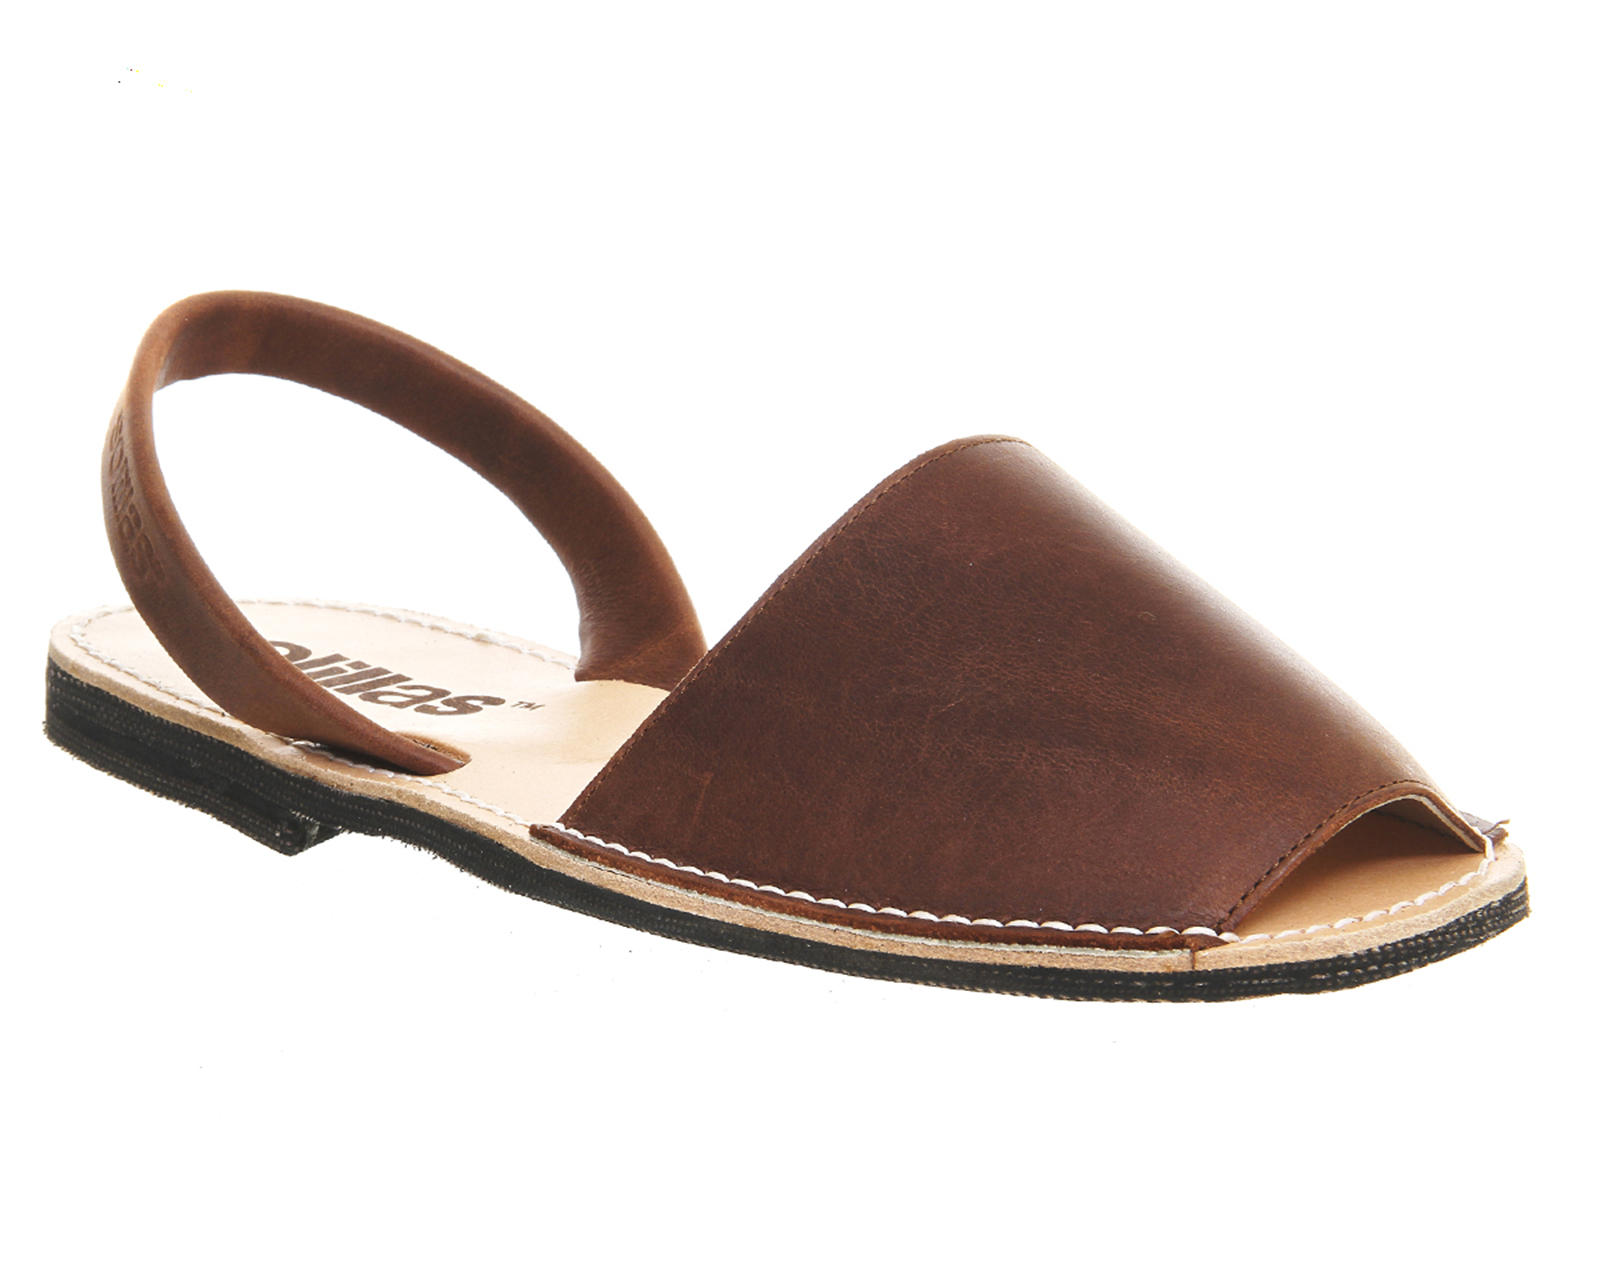 Solillas Solillas Sandals Mens Sandals Brown Leather 2176350015